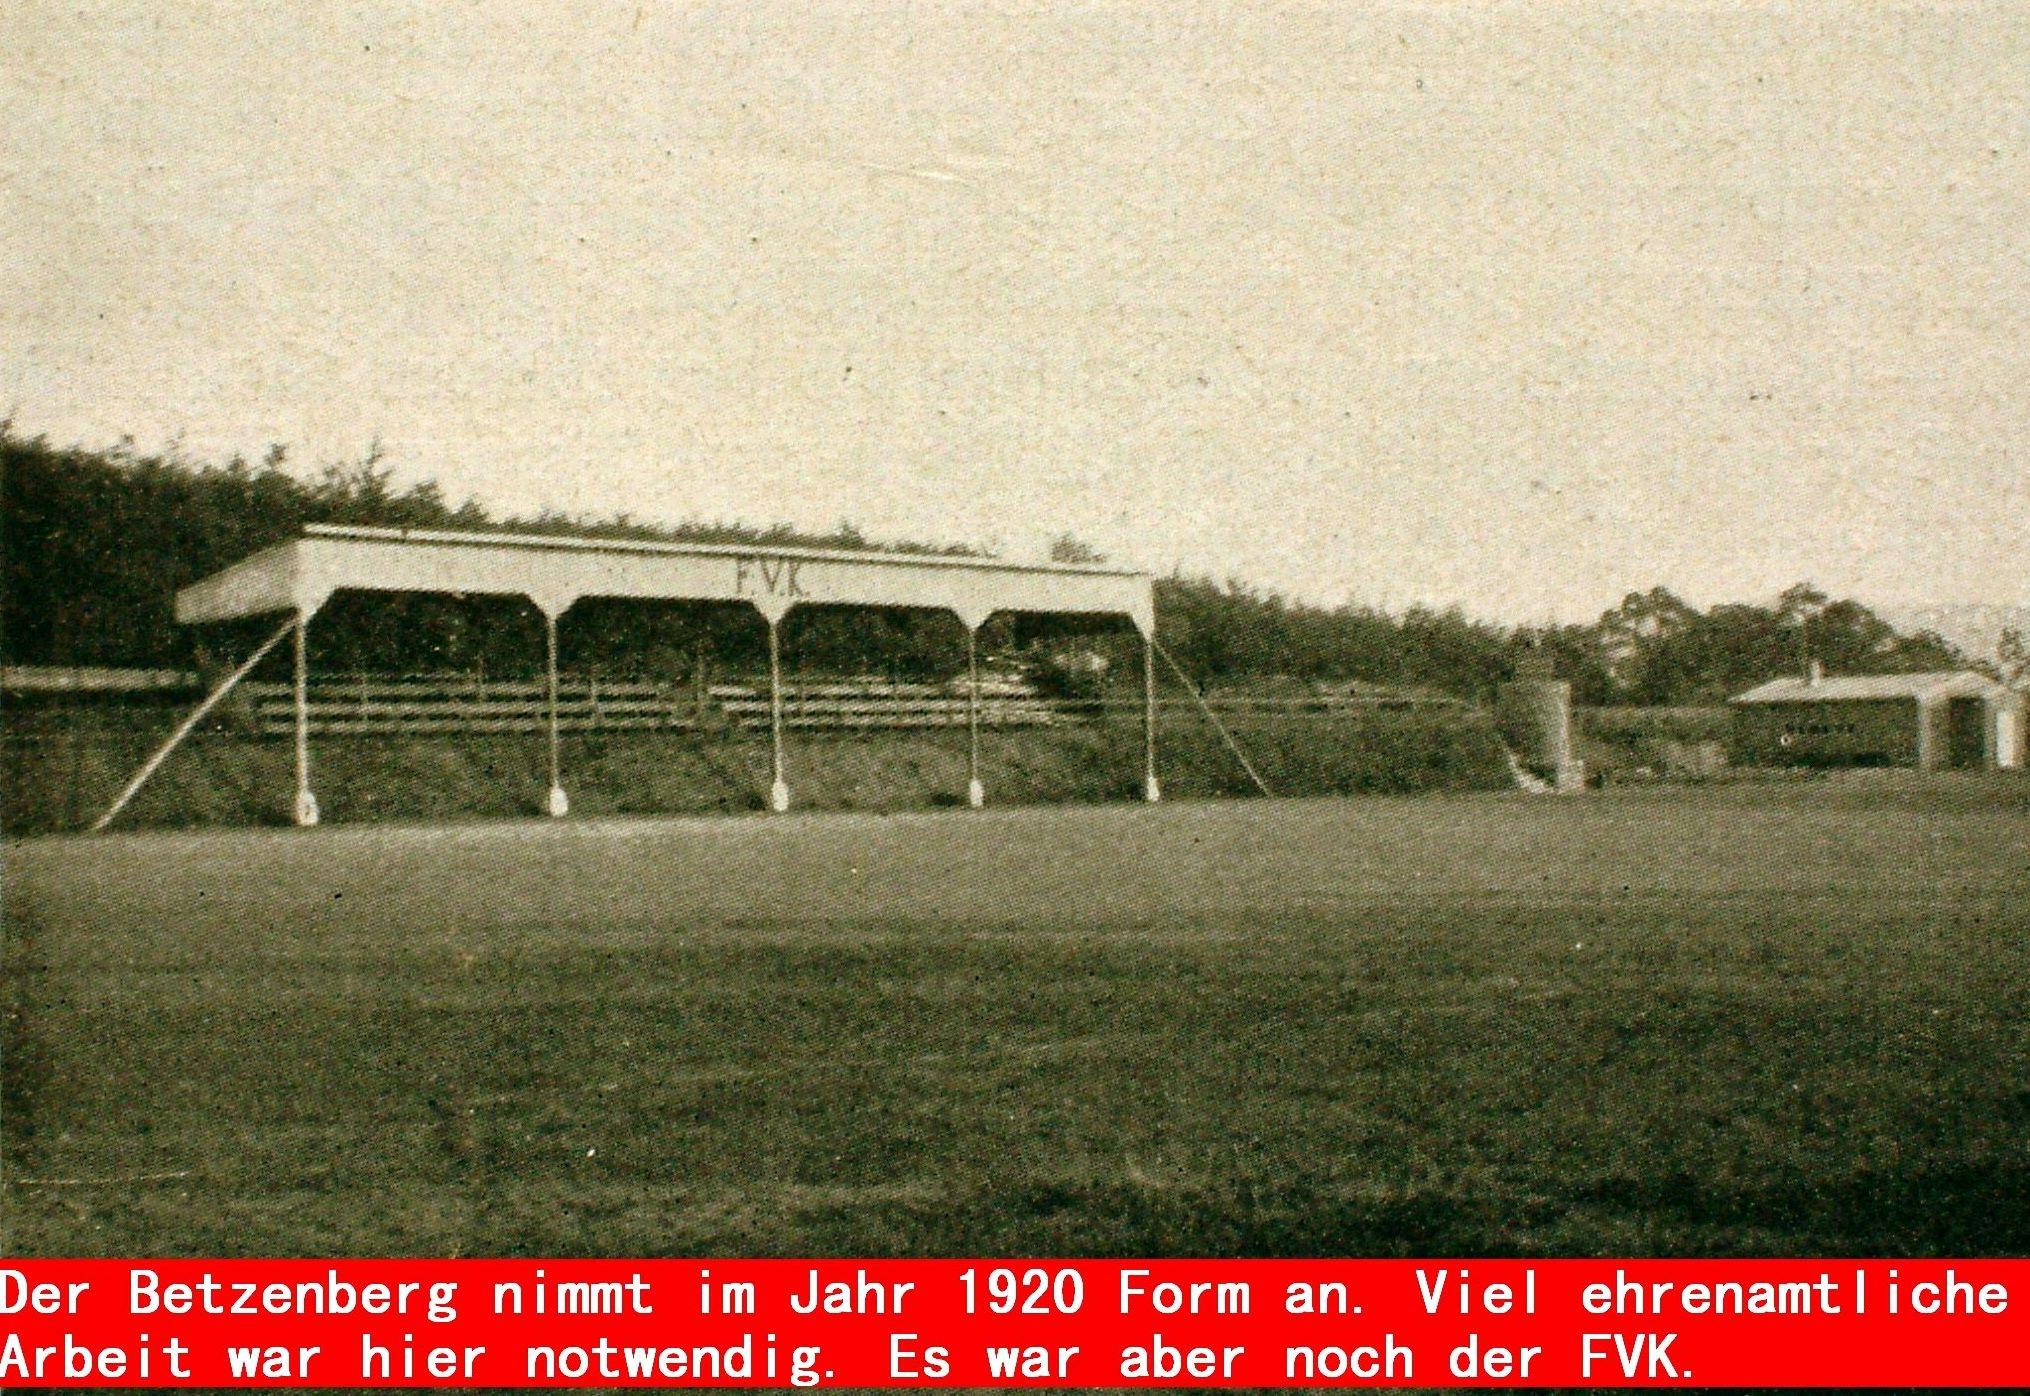 Betzenberg 1920